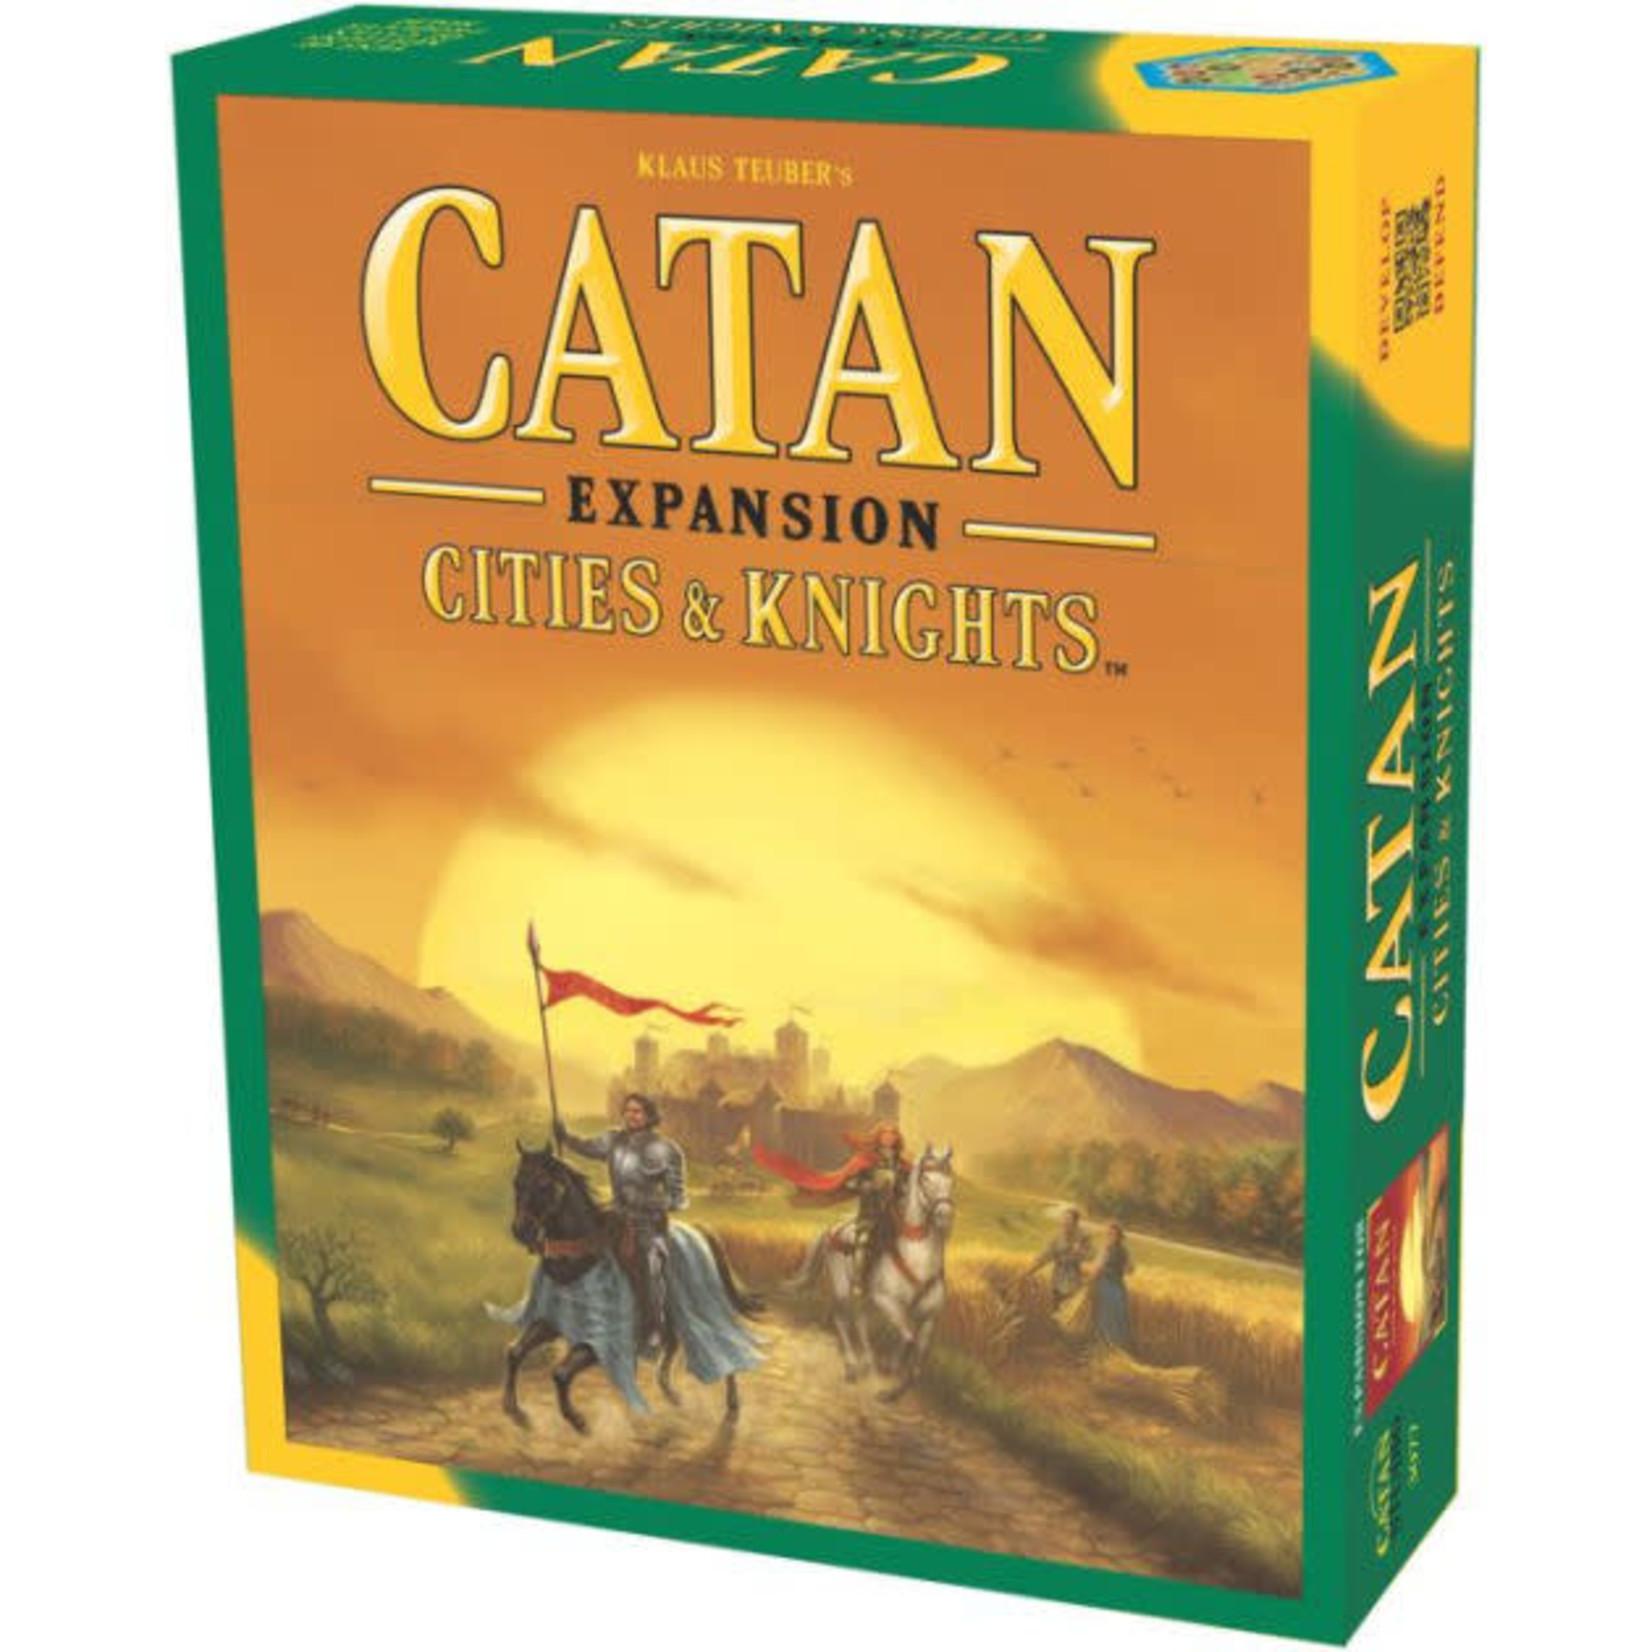 Catan Studios Inc. Catan: Cities & Knights Game Expansion